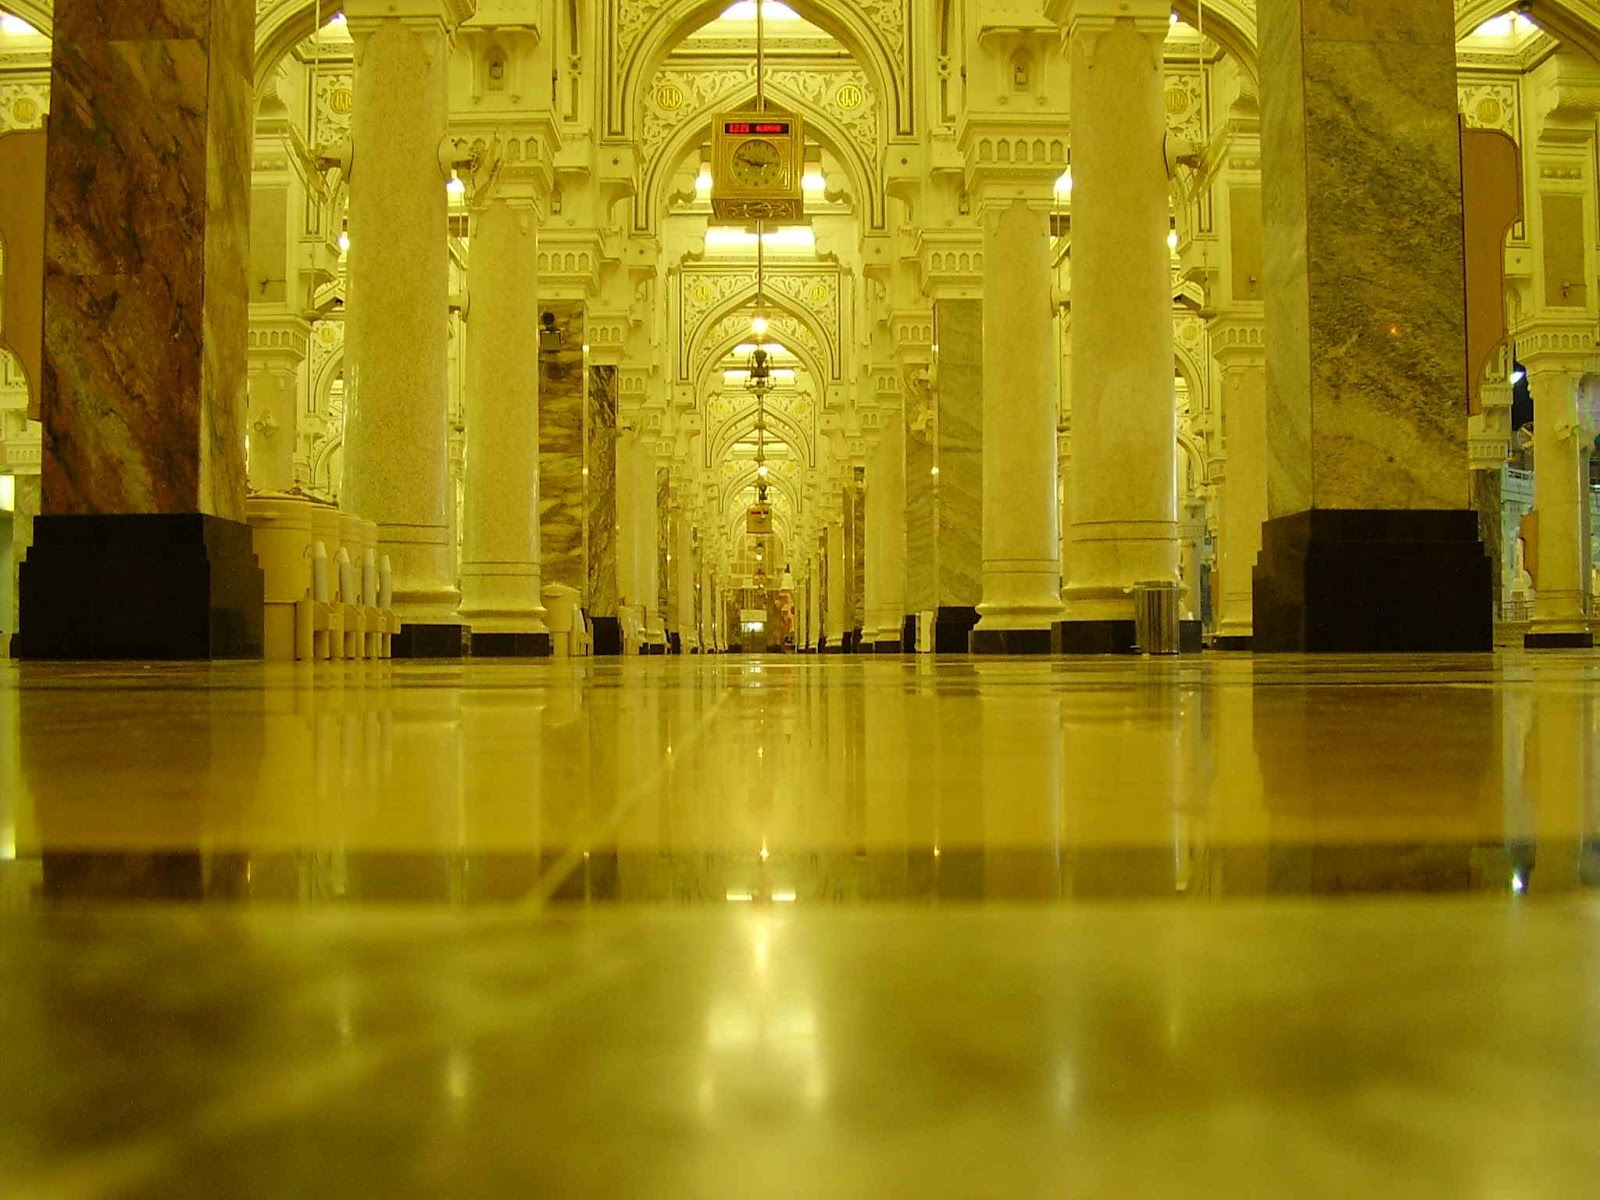 http://3.bp.blogspot.com/-rJ4mSD6UDM0/UDaCxP4n1gI/AAAAAAAAGpM/4BBAZb9rpnk/s1600/islamic-wallpaper-hd-3.jpg